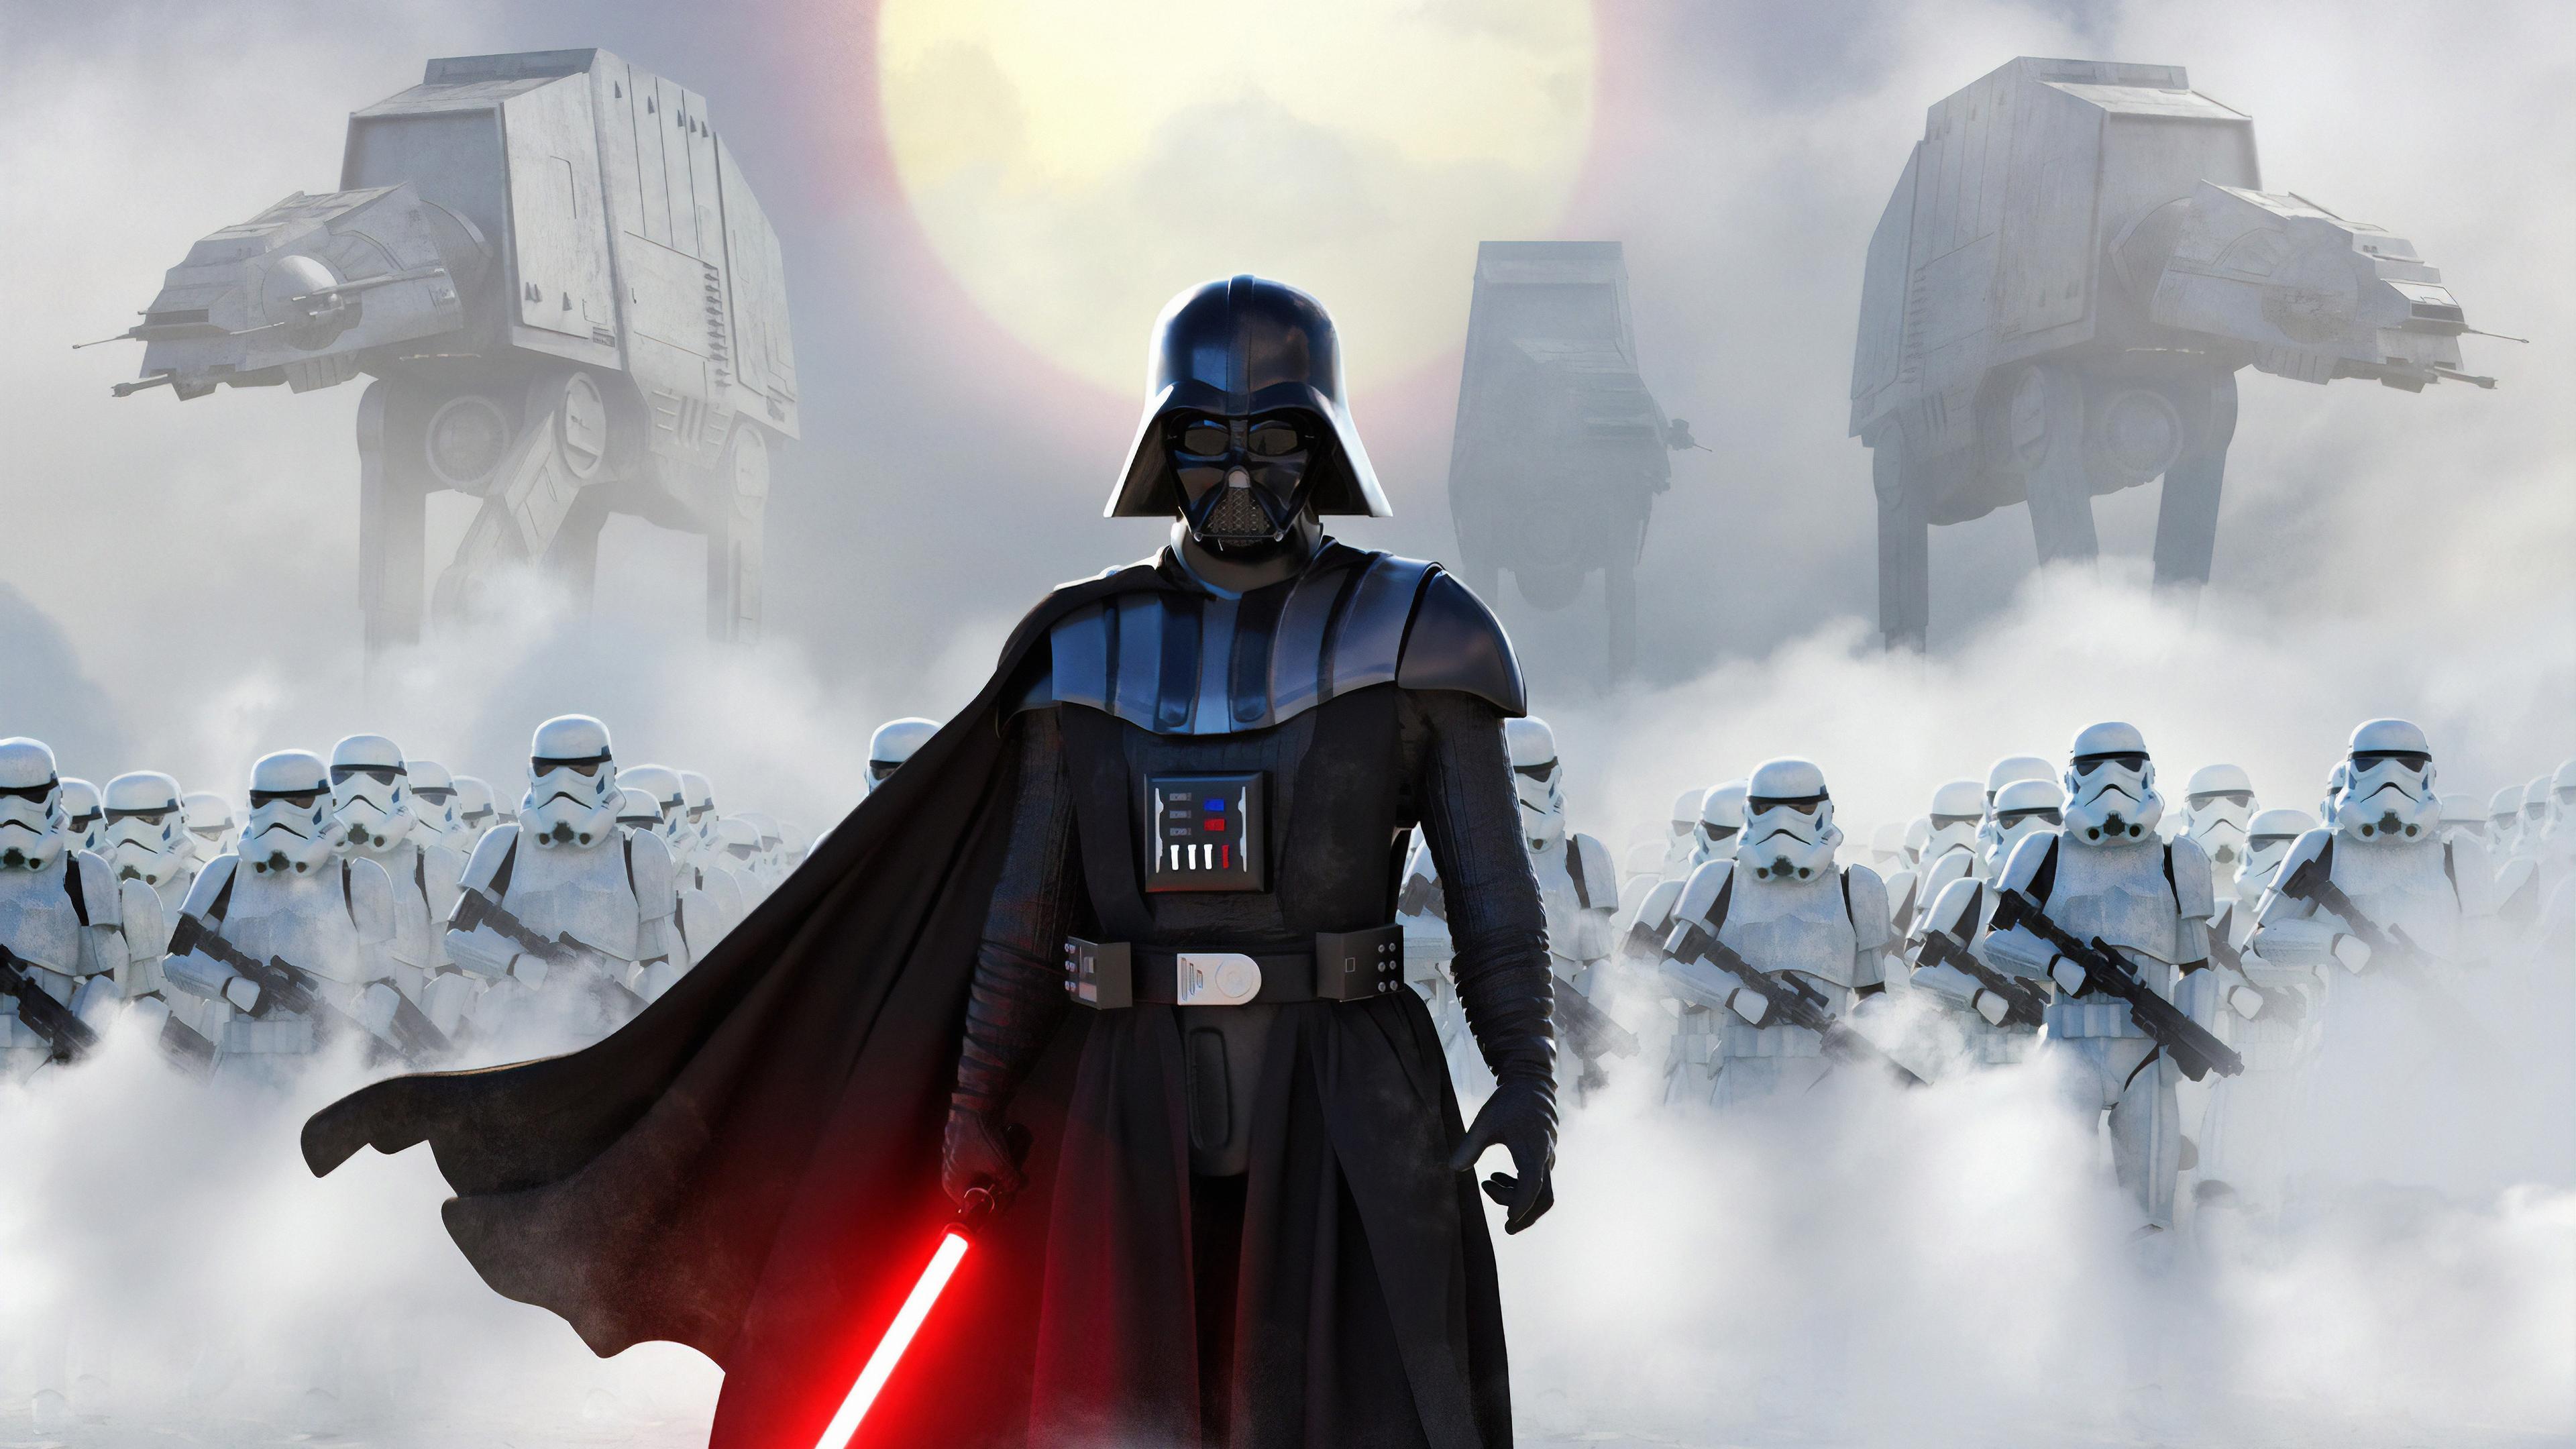 Sci Fi Star Wars 4k Ultra Hd Wallpaper Background Image 3840x2160